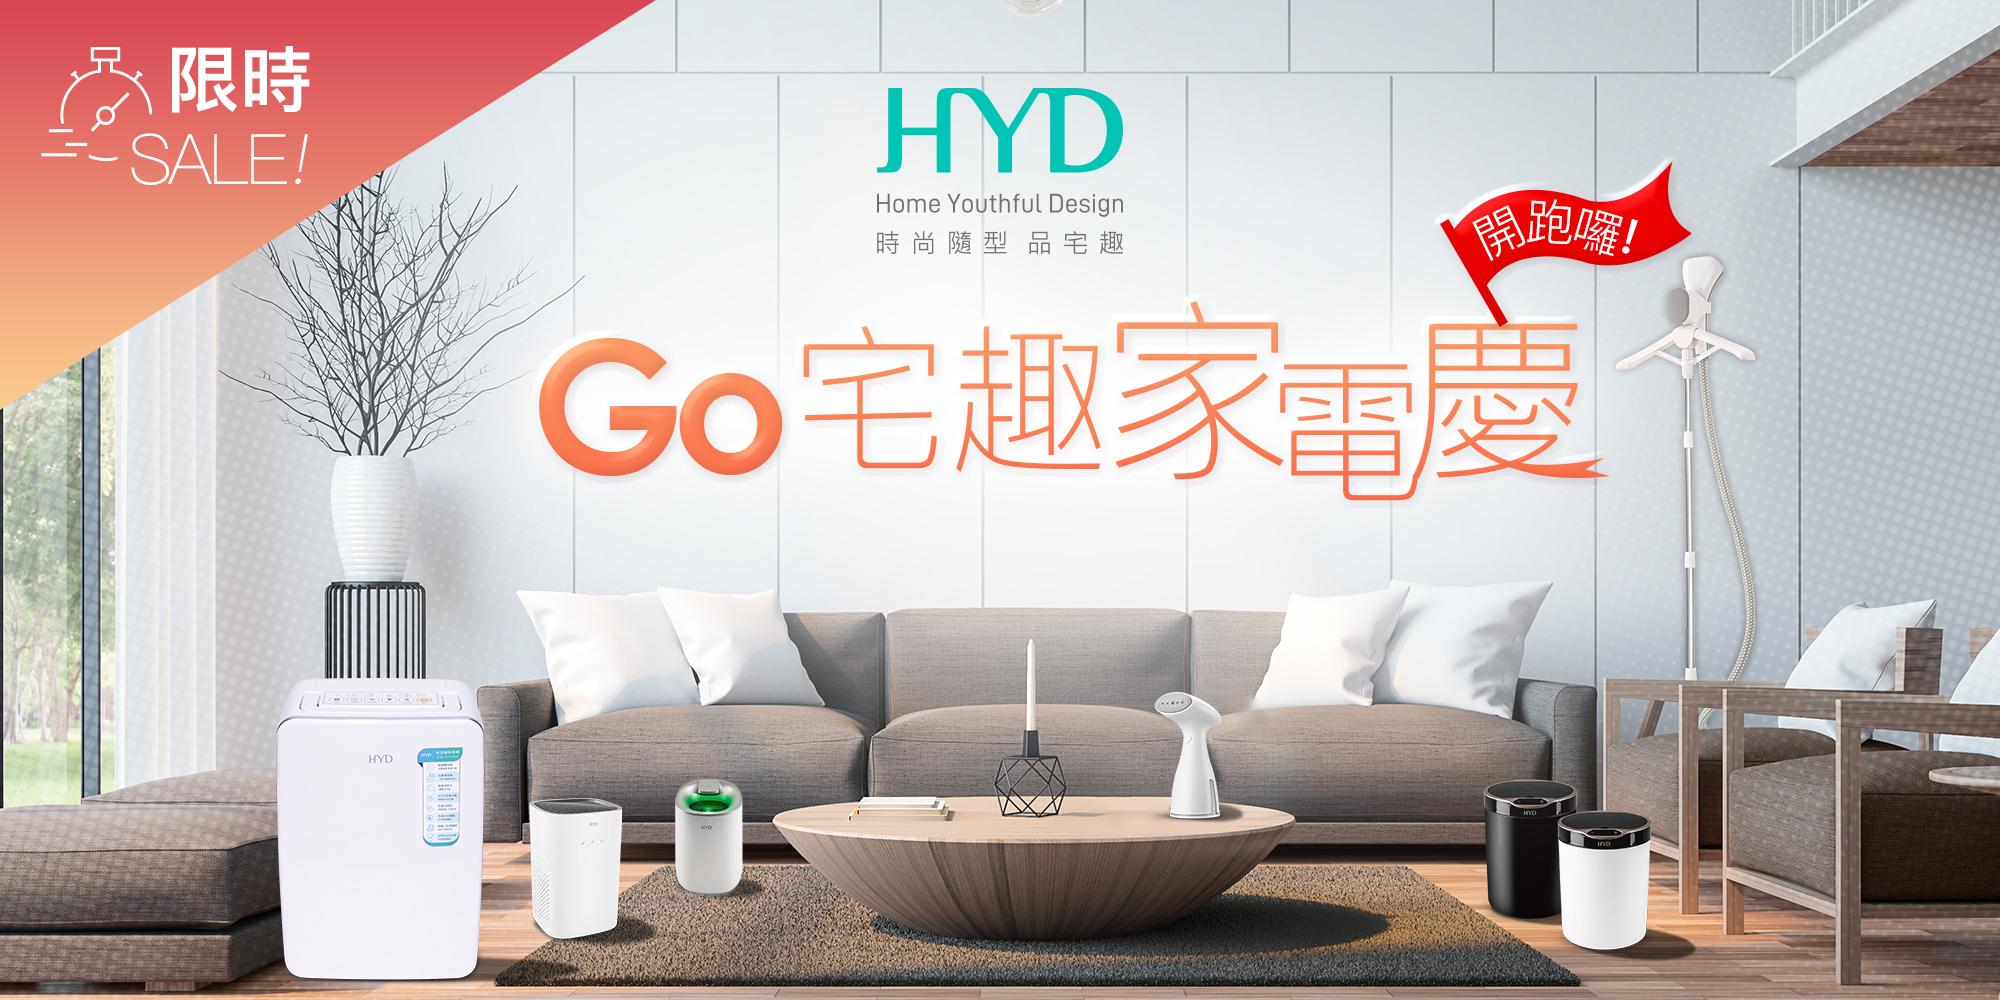 HYD,家電,掛燙機,空氣清淨機,感應垃圾桶,除濕機